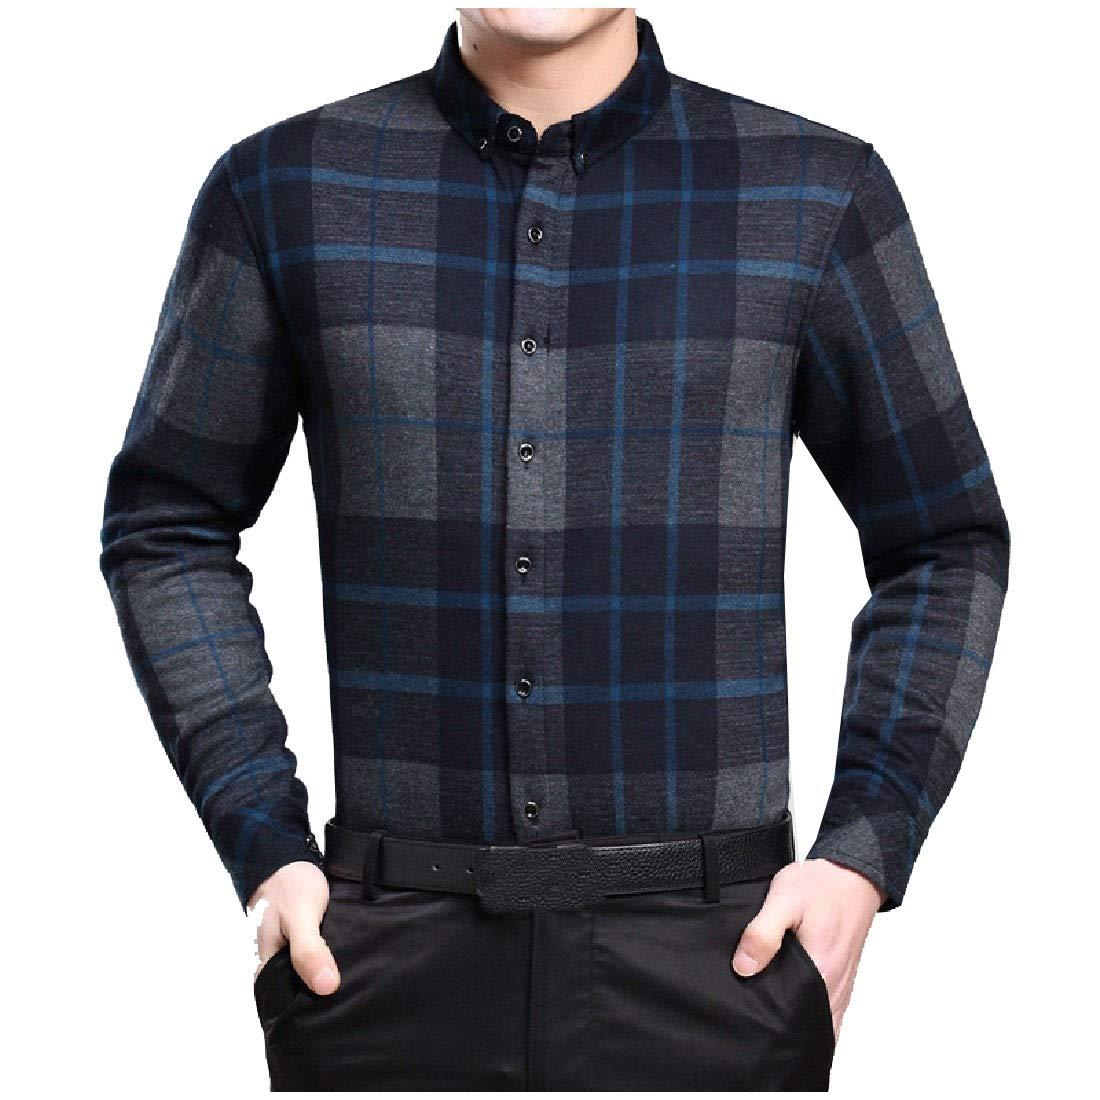 YUNY Mens Warm Long Sleeve Stripes Mandarin Collar Casual T-Shirts Shirts AS2 XS